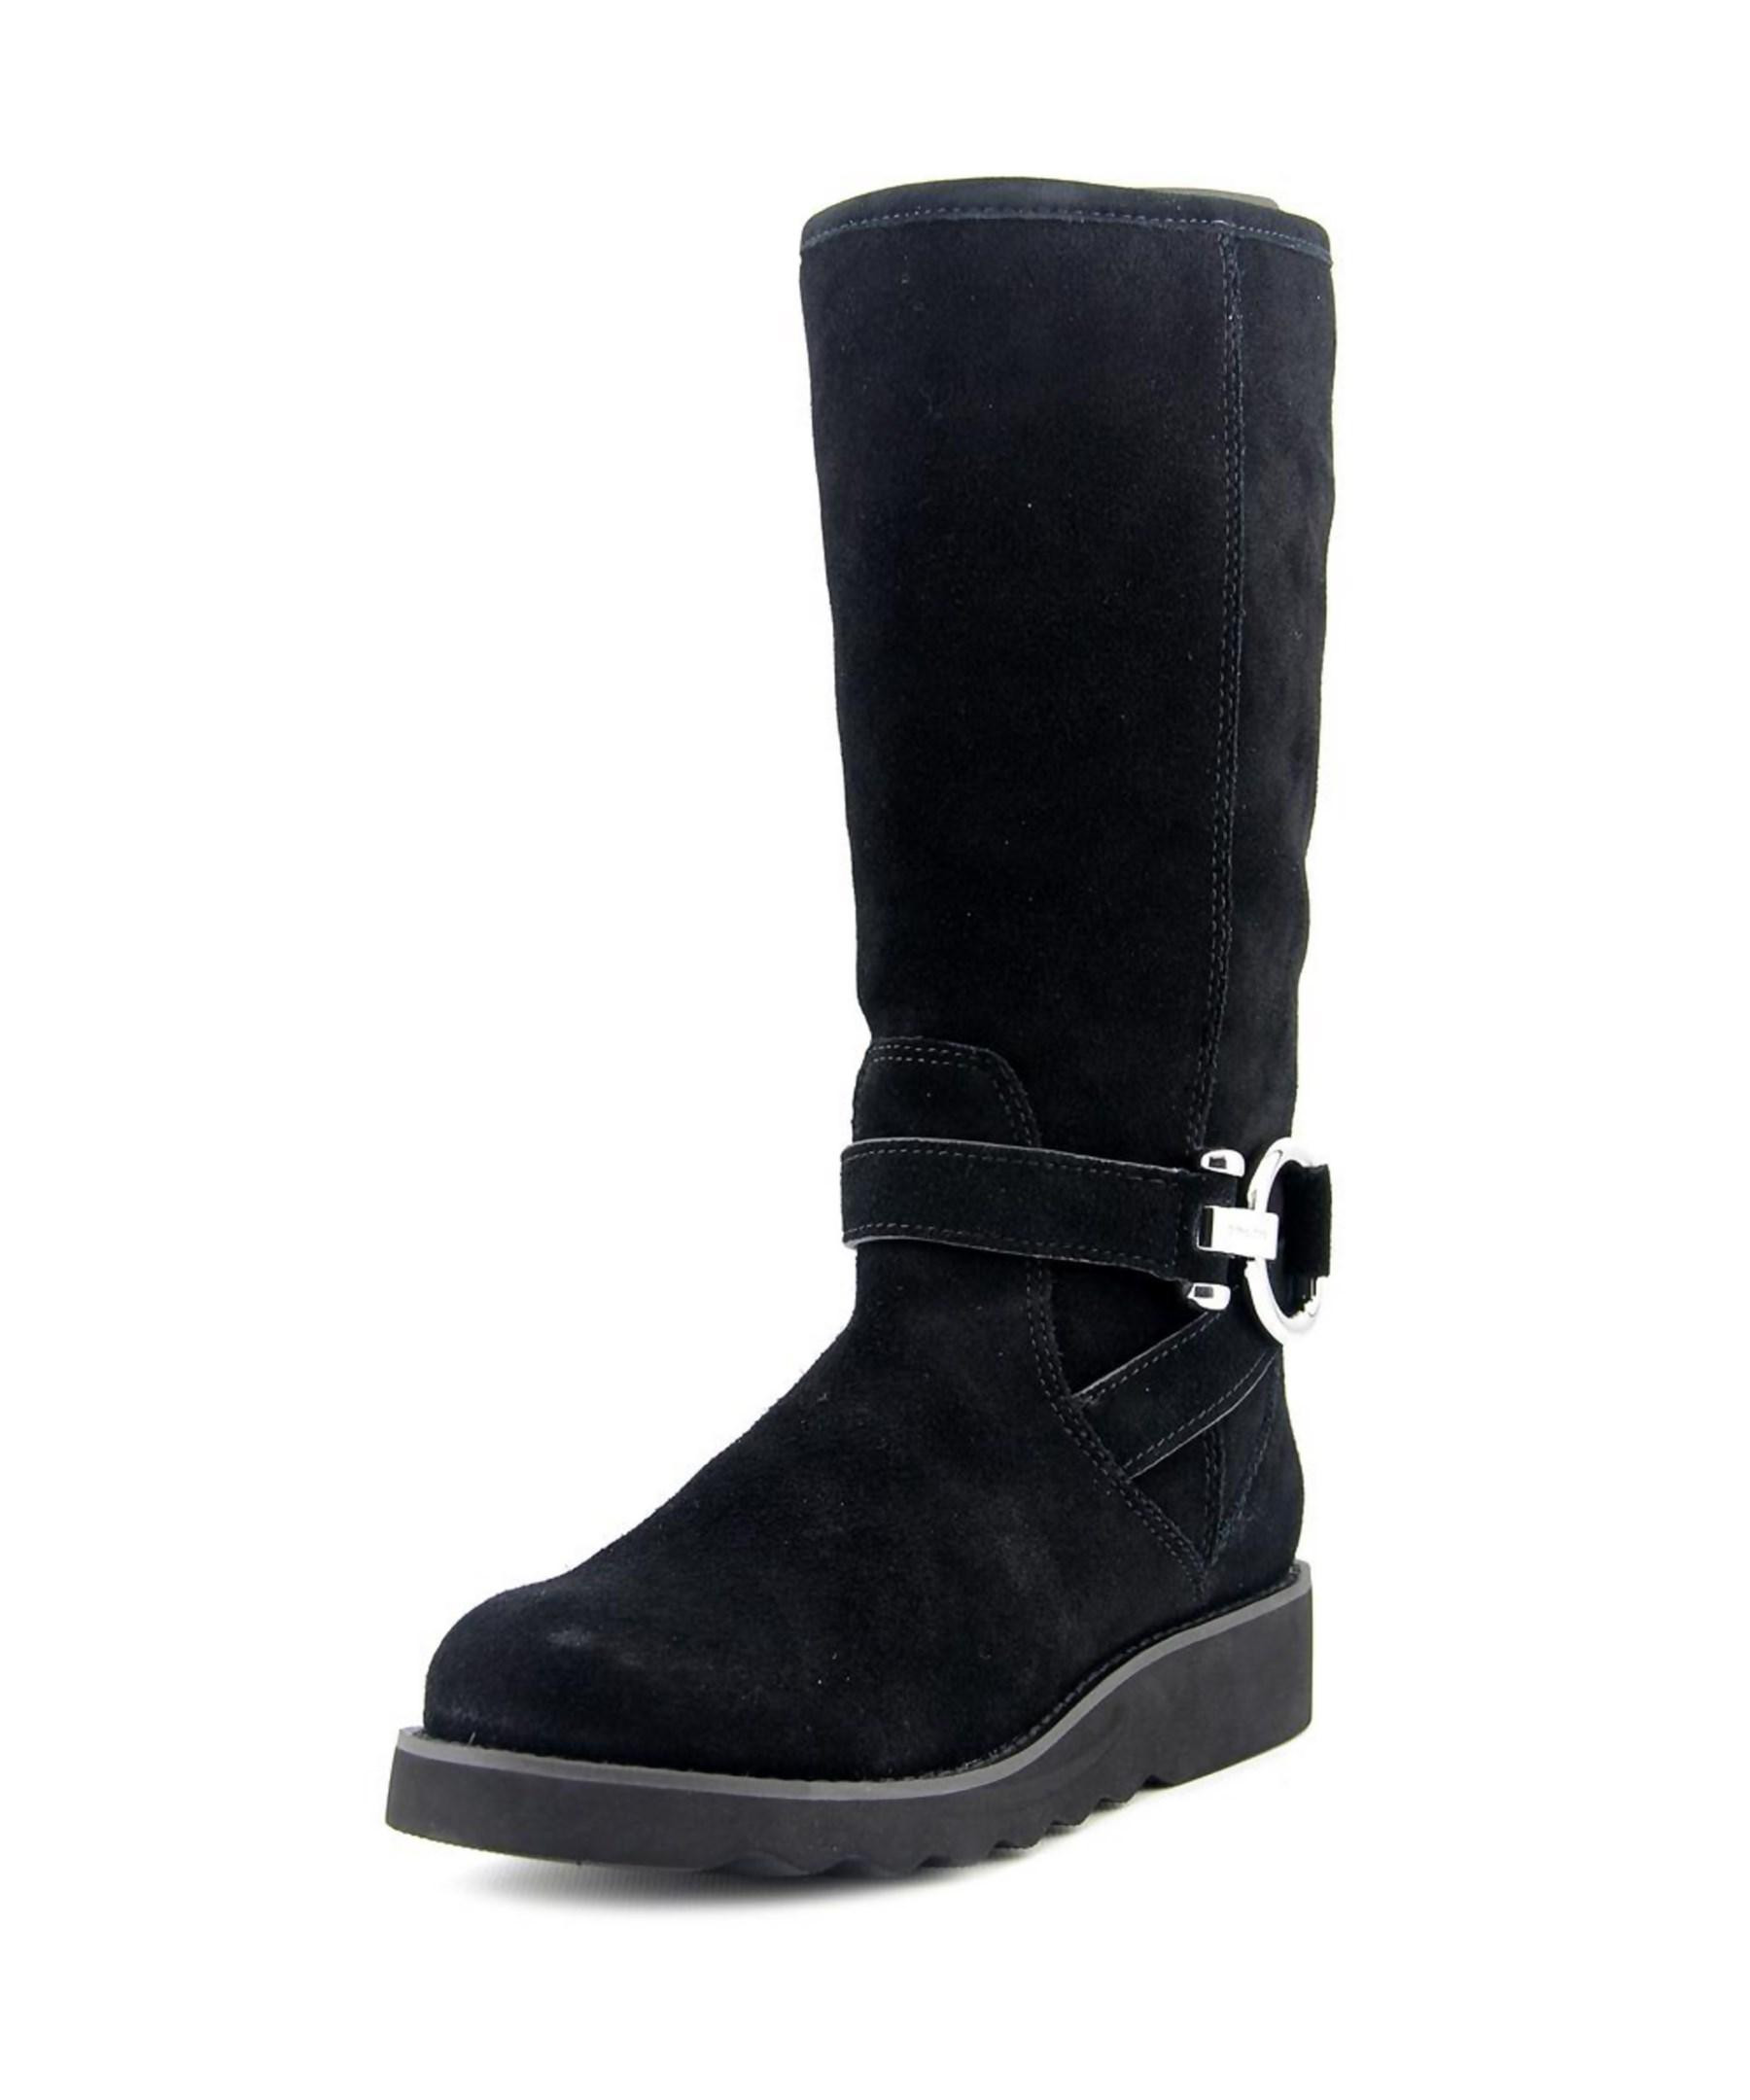 coach virtue toe suede black winter boot in